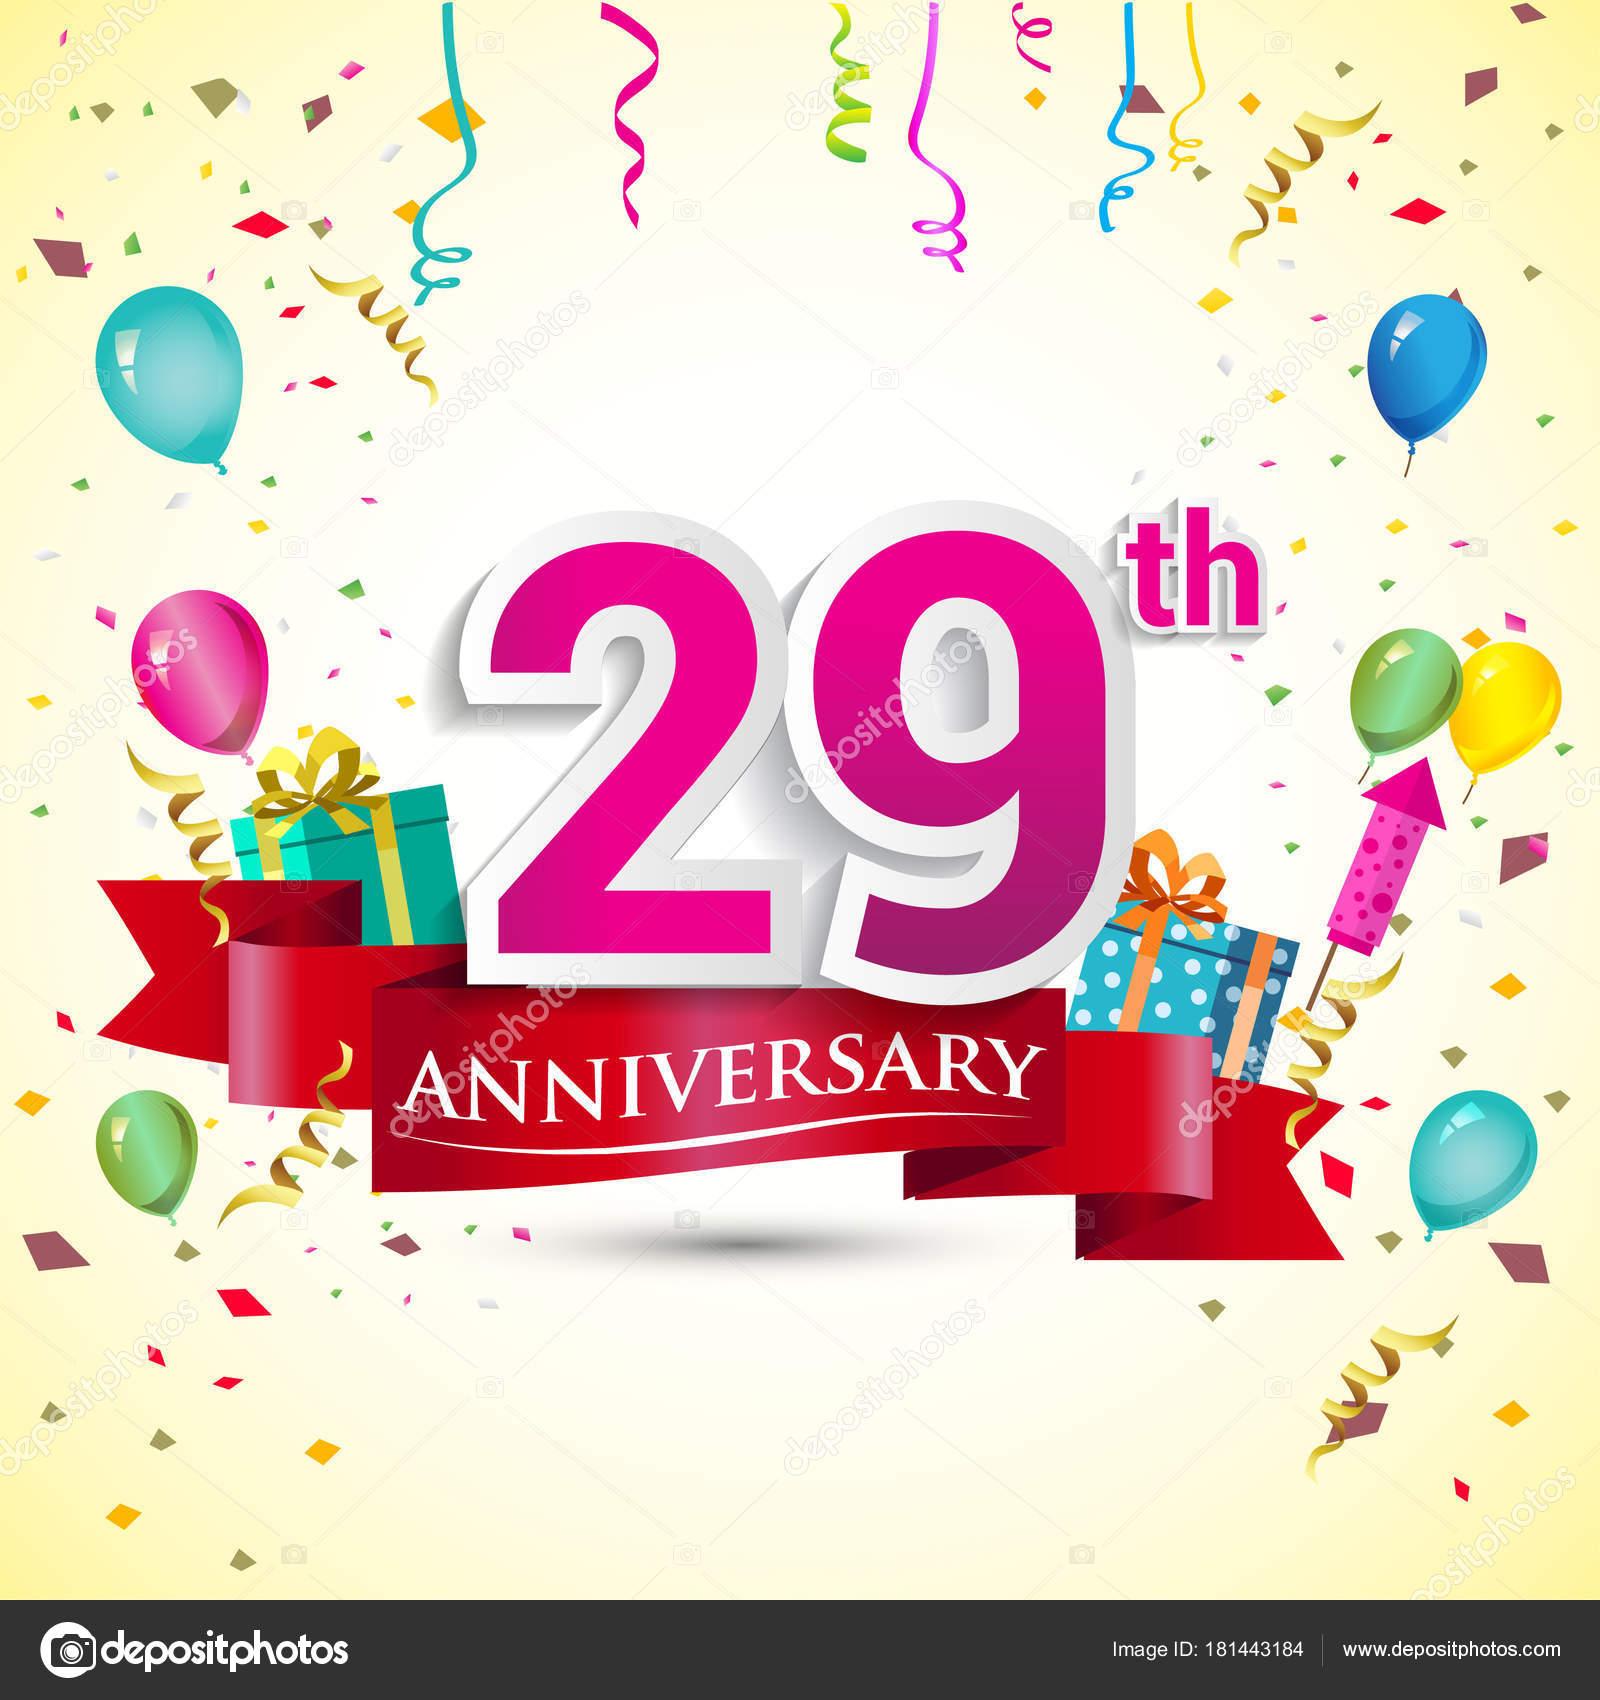 29Th Anniversary Celebration Design Gift Box Balloons Red Ribbon ...